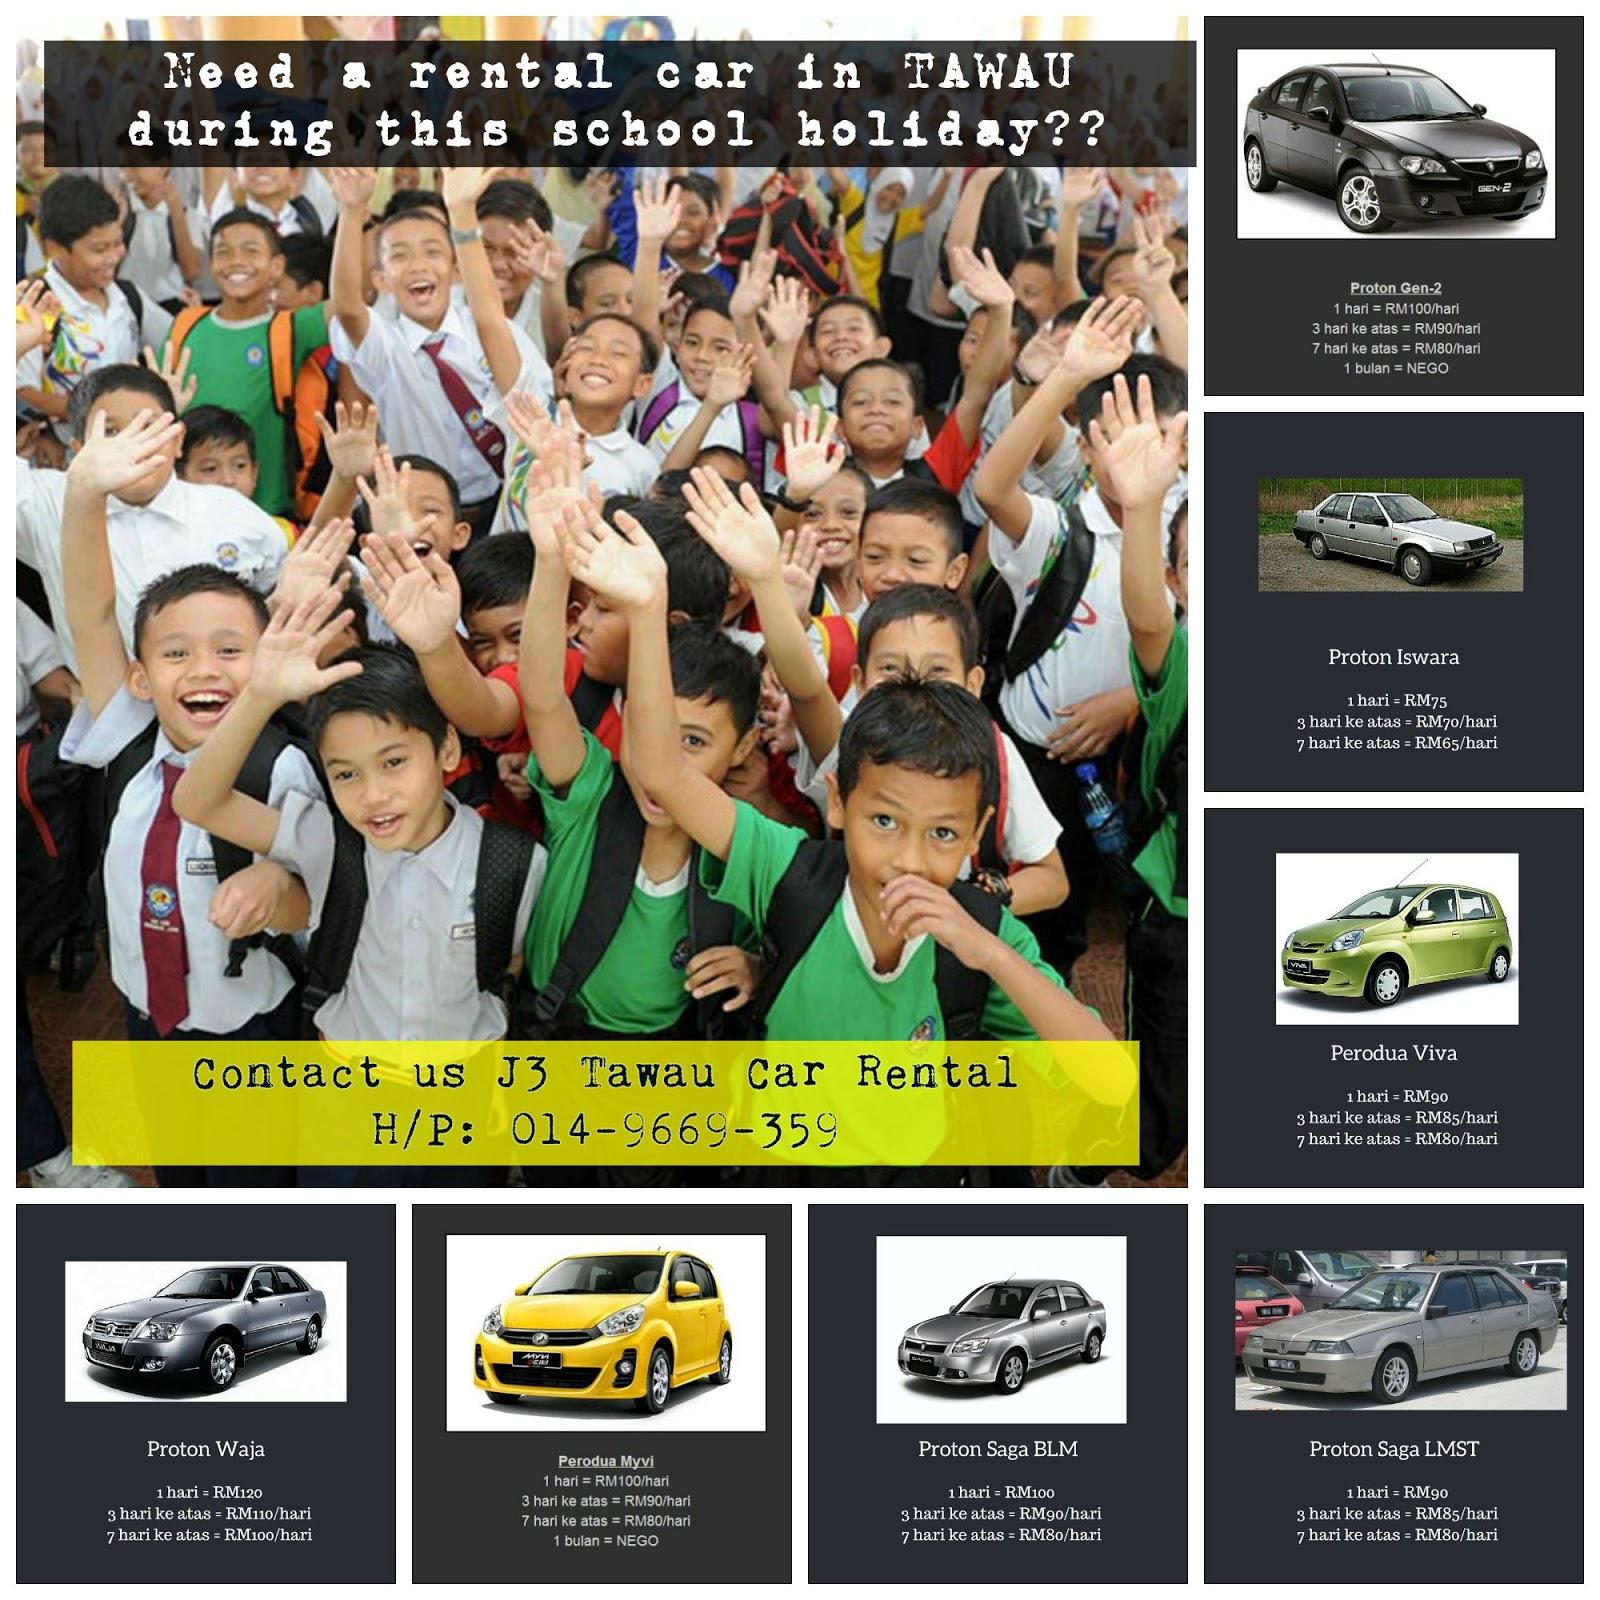 Tawau Low Cost Car Rental Service: September 2015